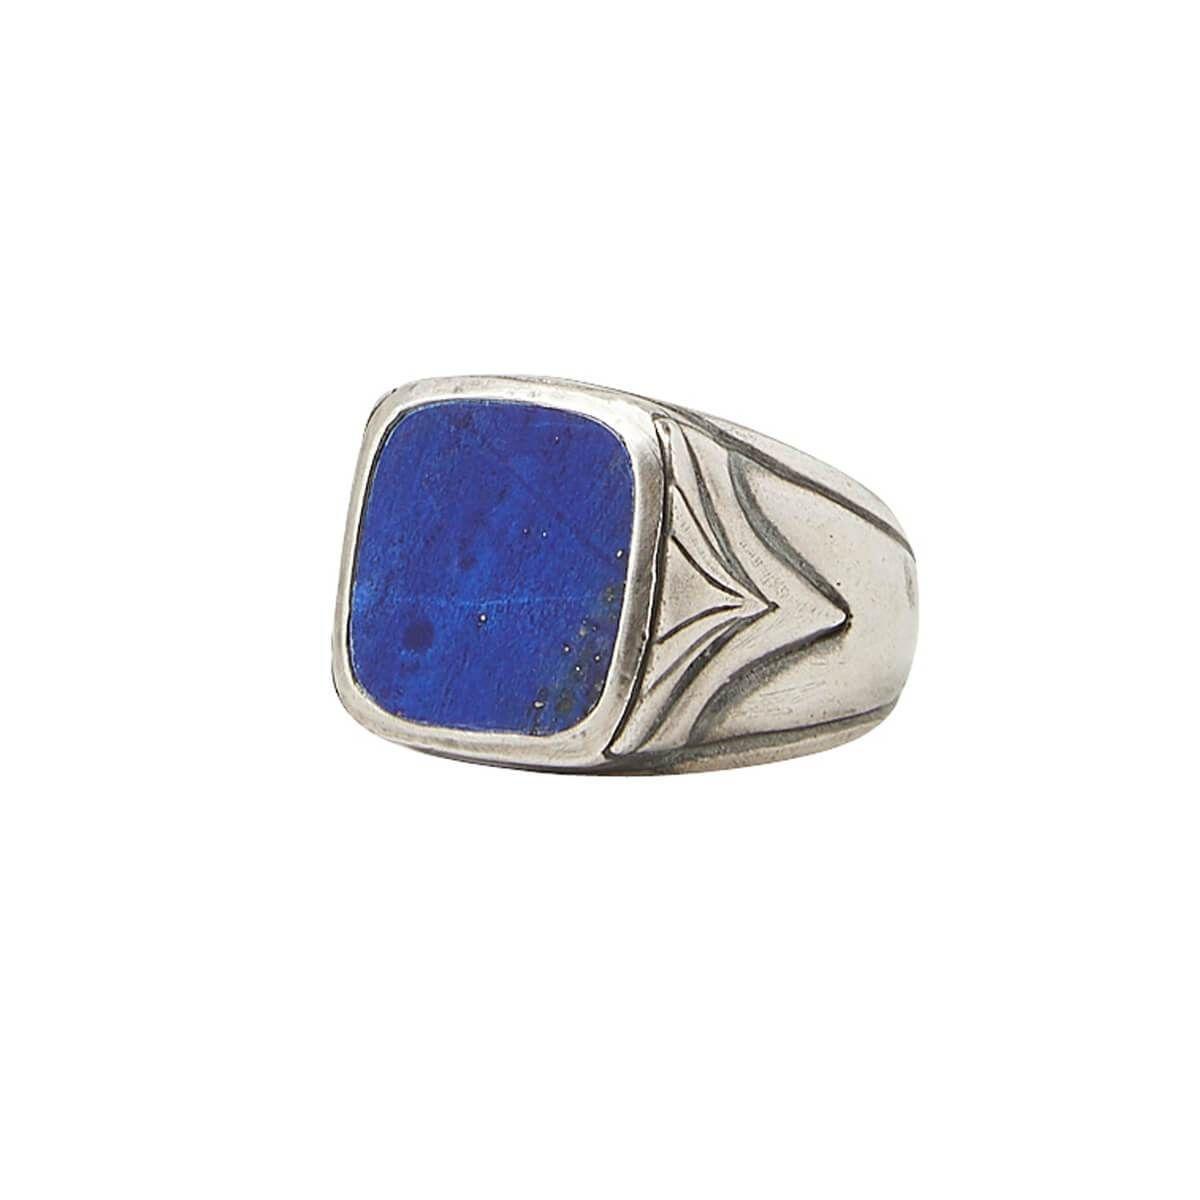 John Varvatos BLUE LAPIS RING Sterling Silver Classic Mens Ring